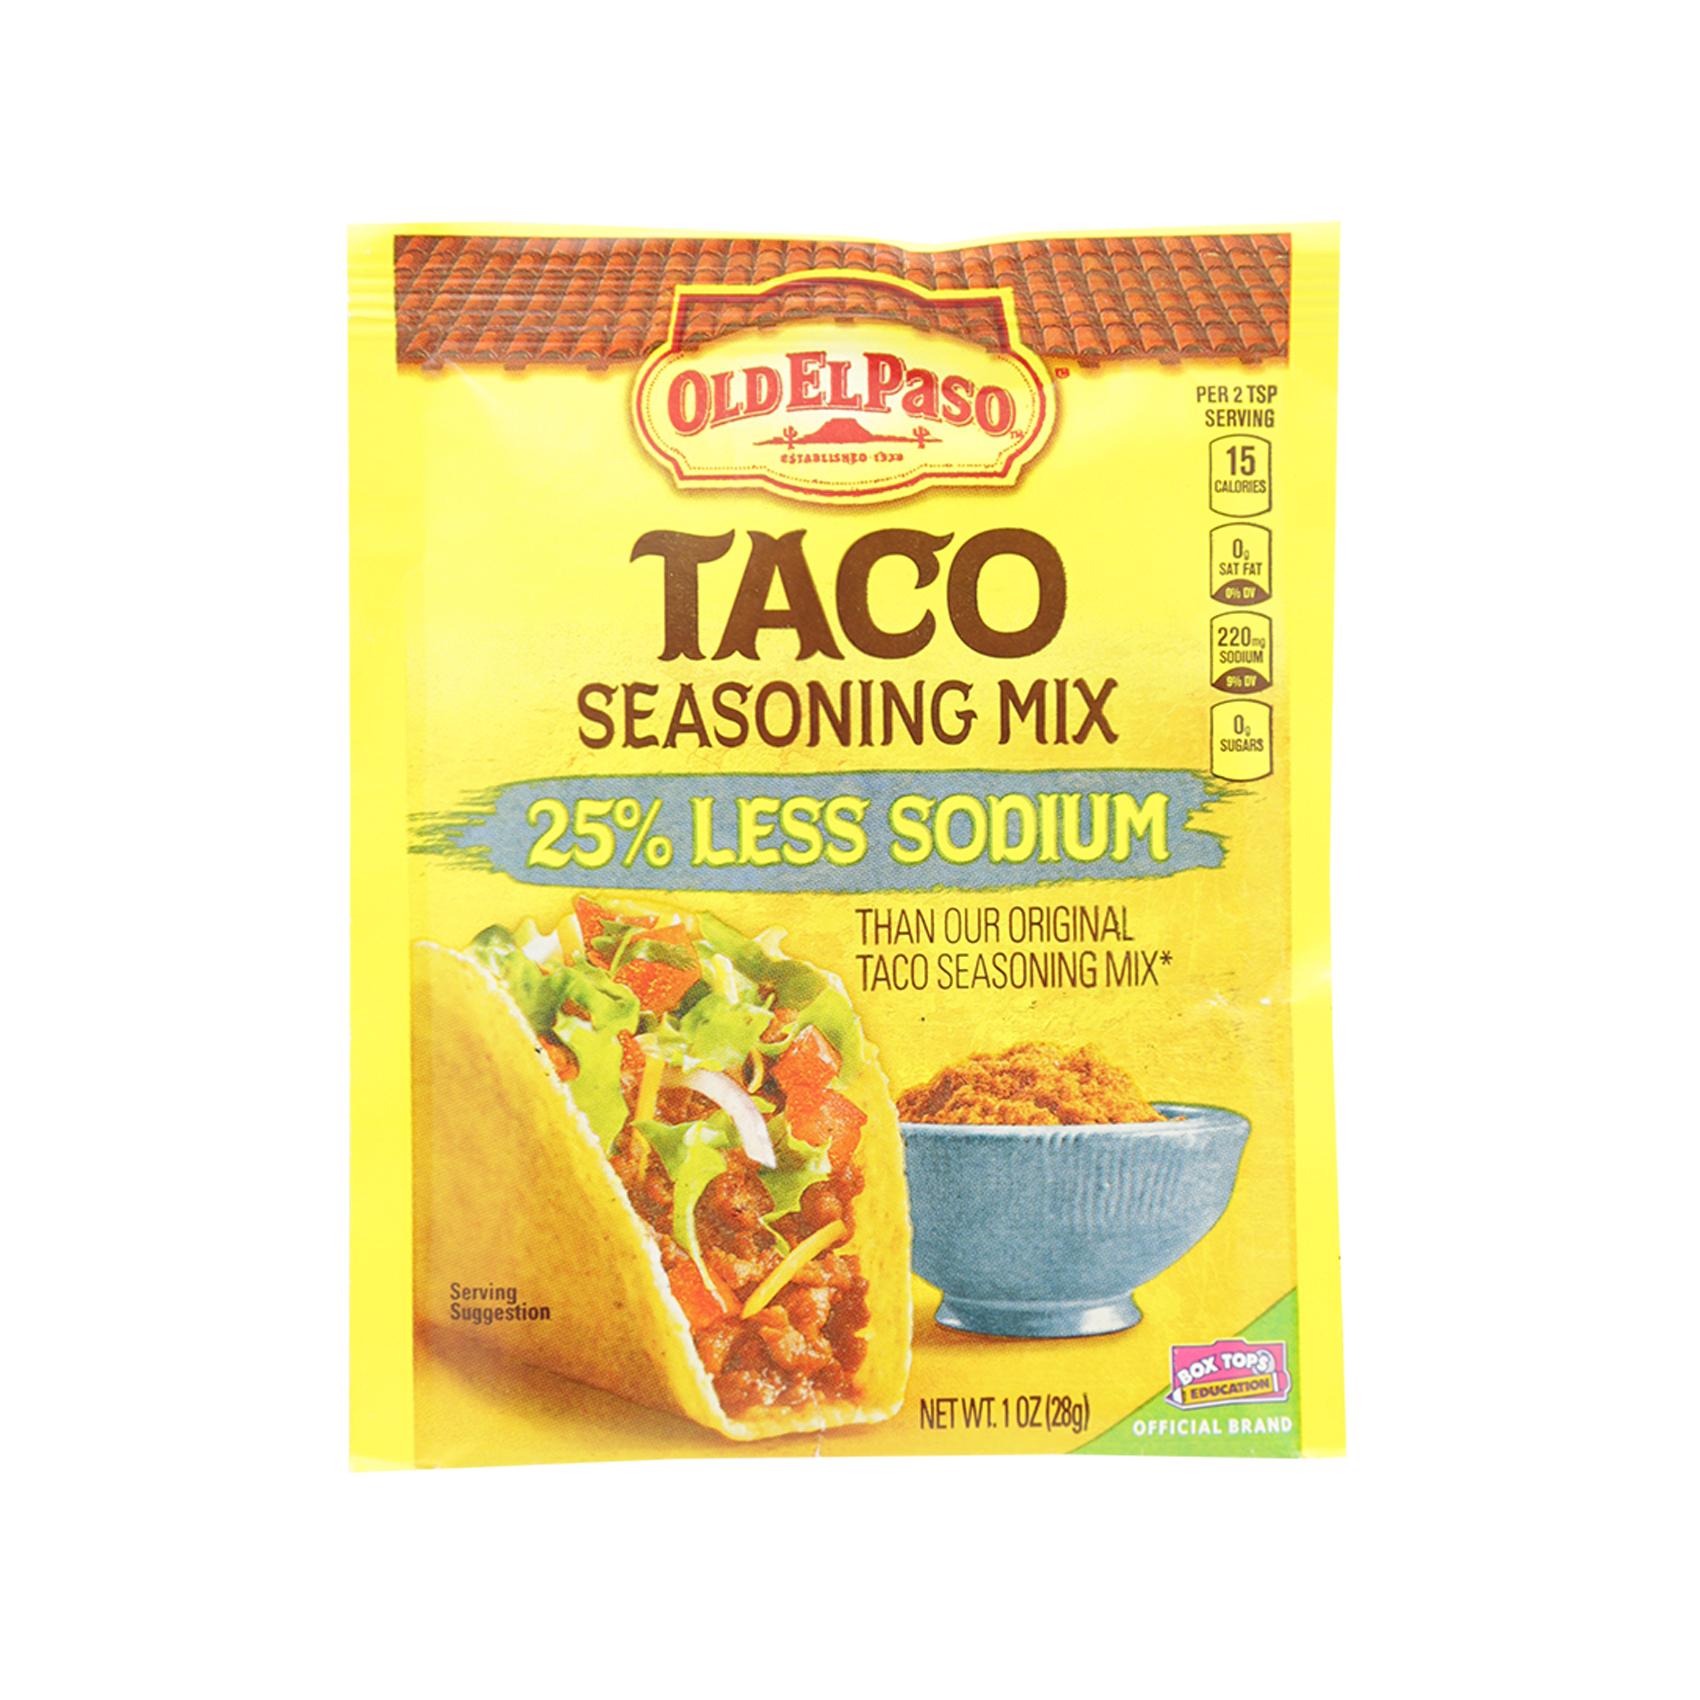 Buy Old El Paso Taco Seasoning Mix 25 Less Sodium 28g Online In Uae